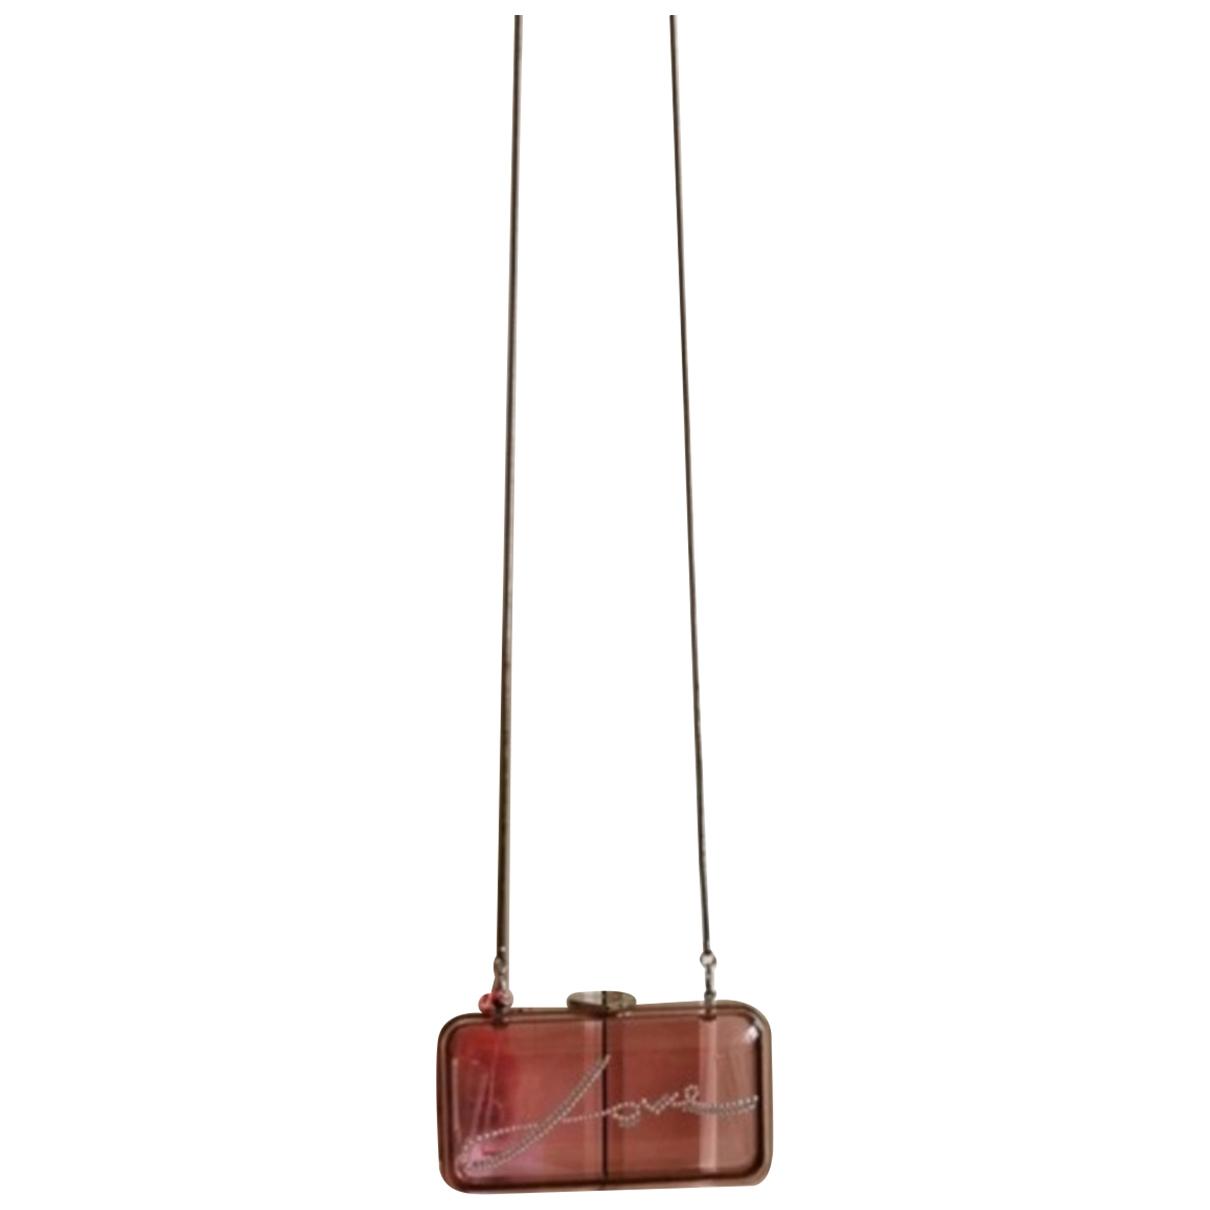 Bolsos clutch en Plastico Rosa Giambattista Valli X H&m